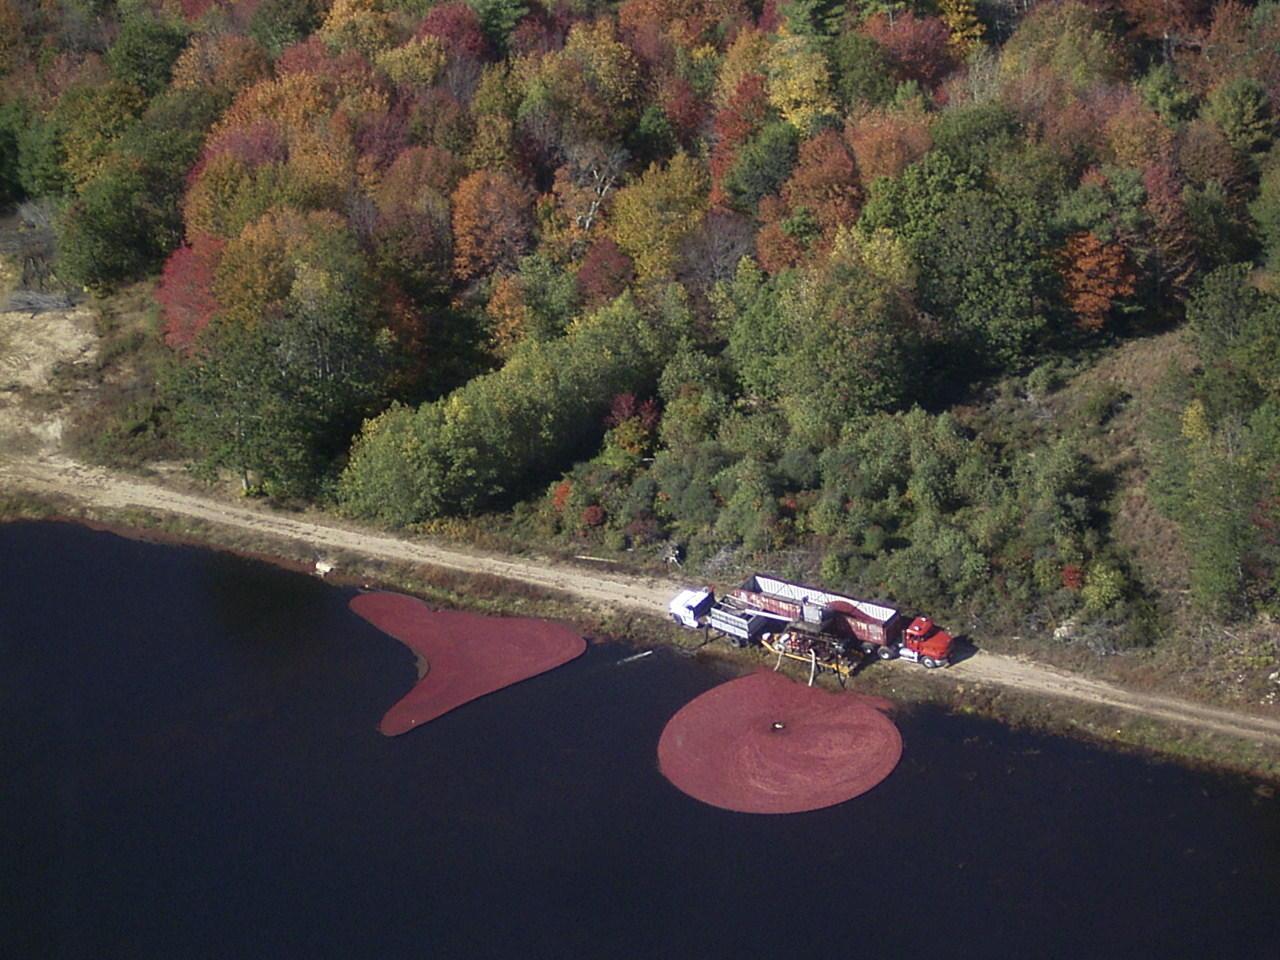 Cranberry Harvest - South Shore, MA